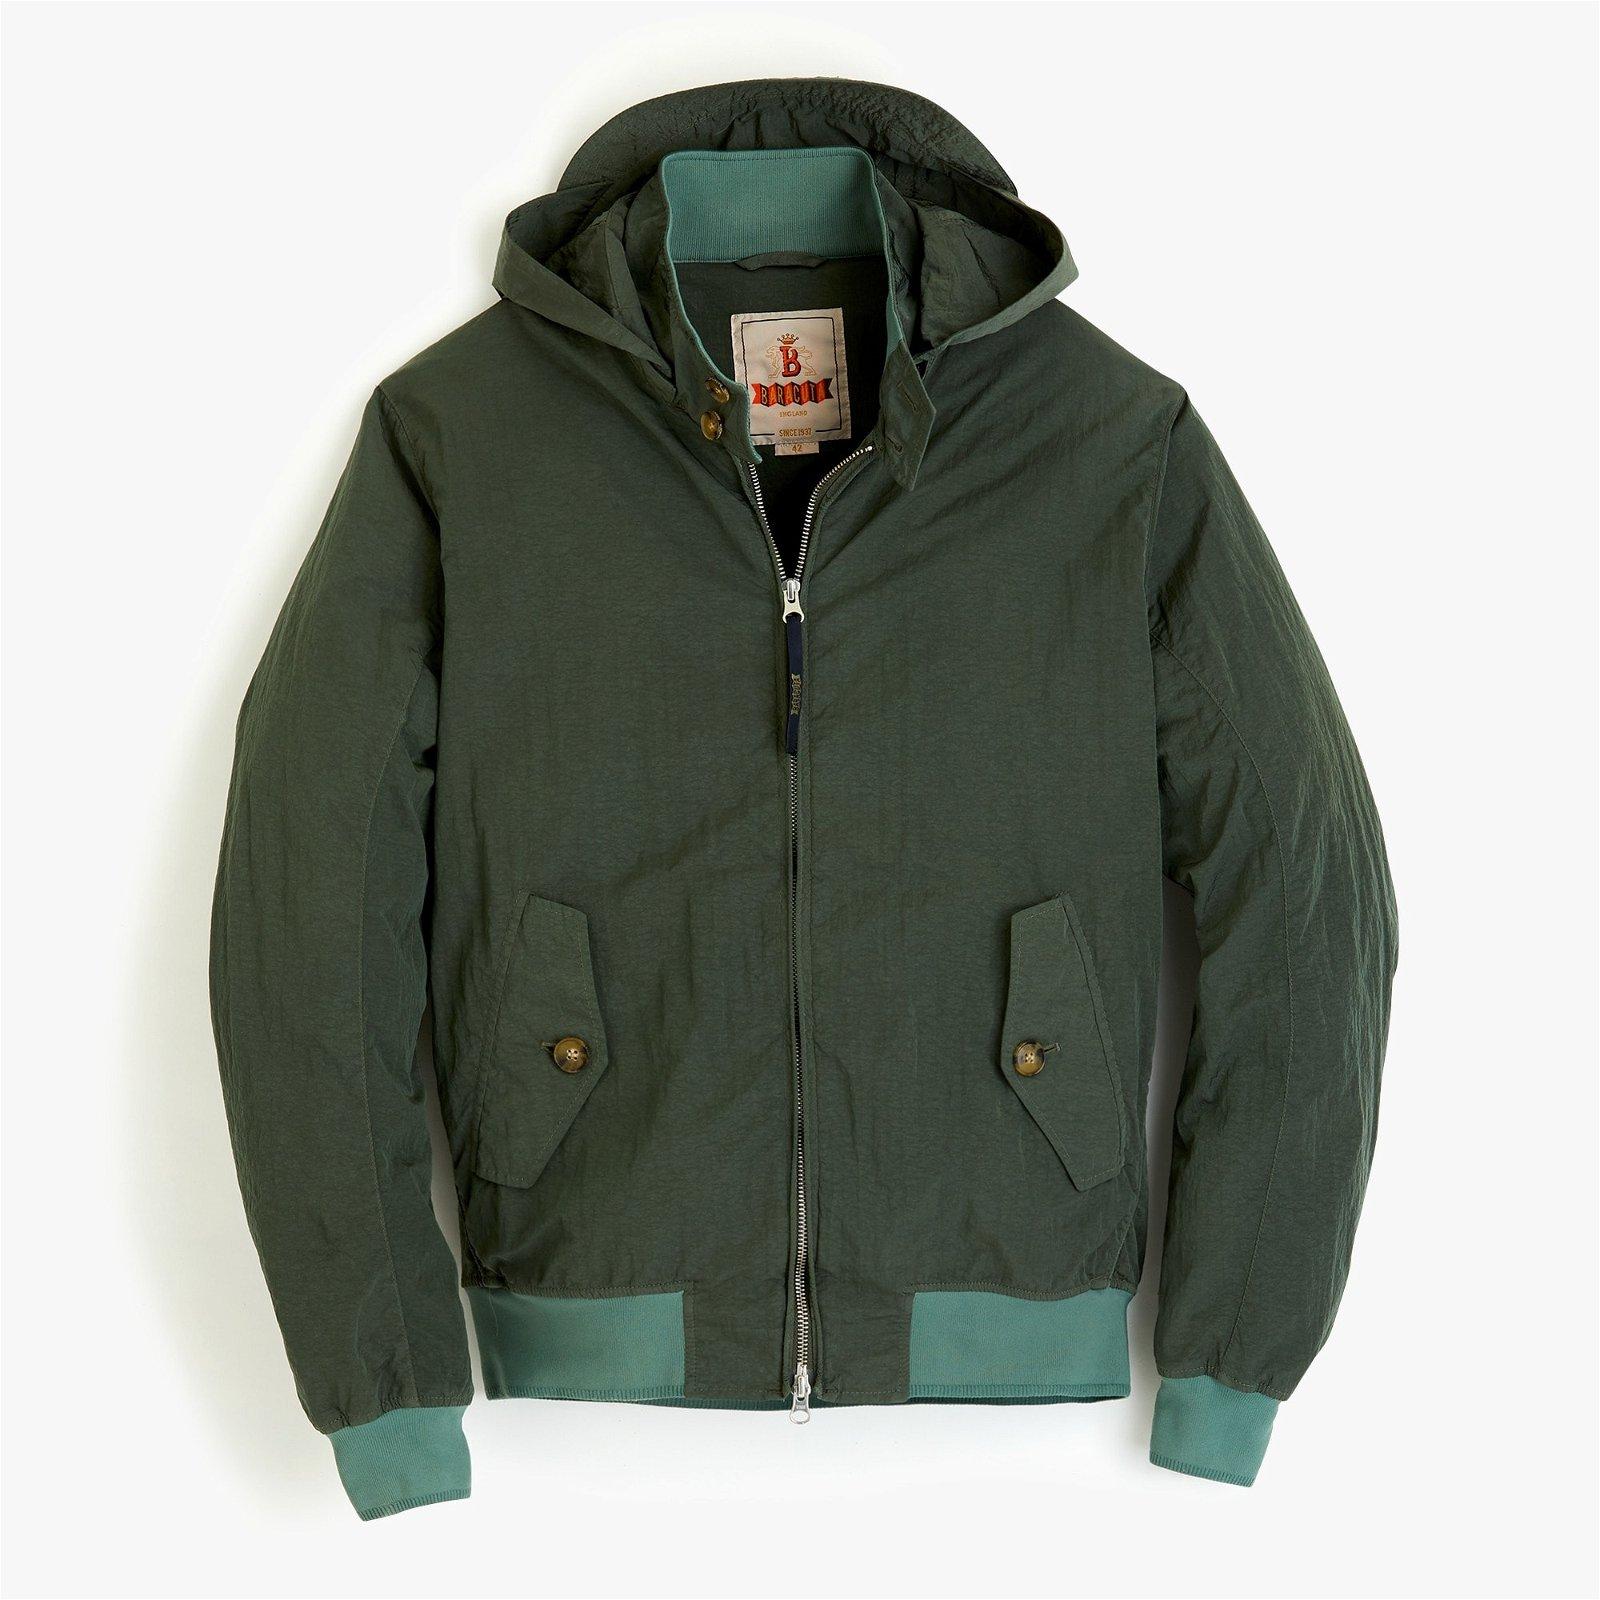 Baracuta® G9 Harrington jacket with detachable hood